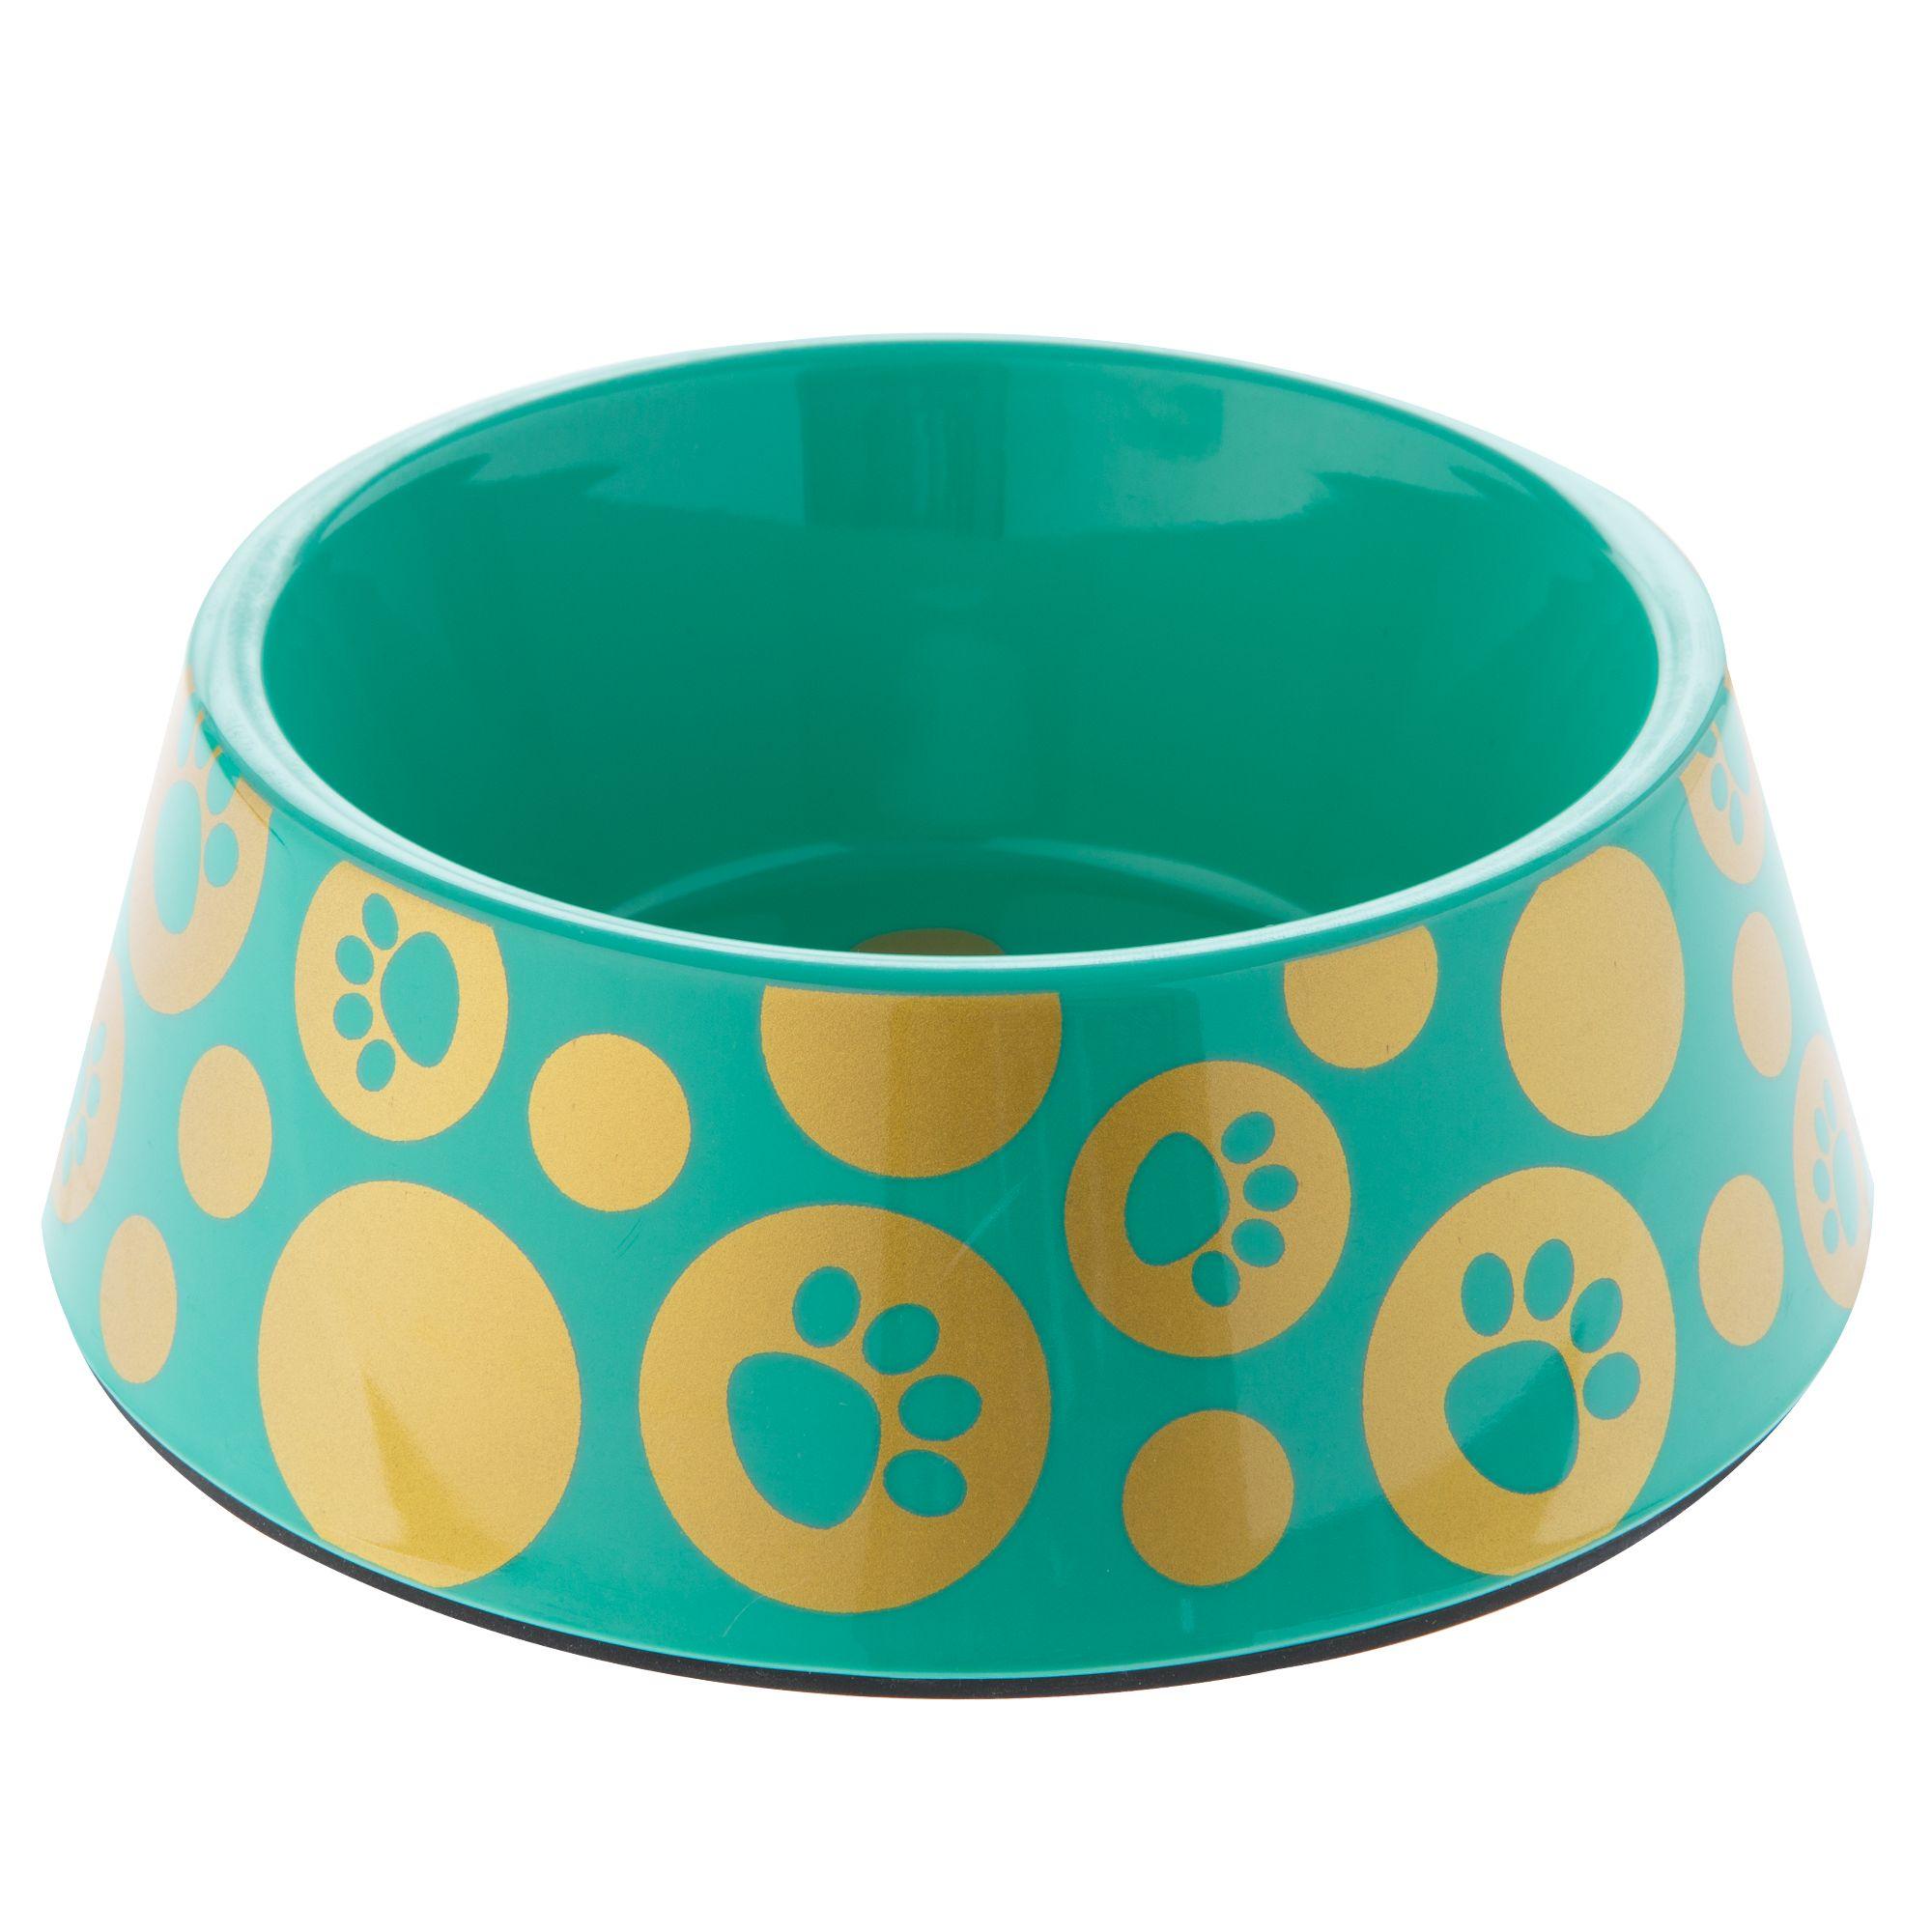 Top Paw Glitz Paws Dog Bowl size: 3 C, Turquoise 5250219